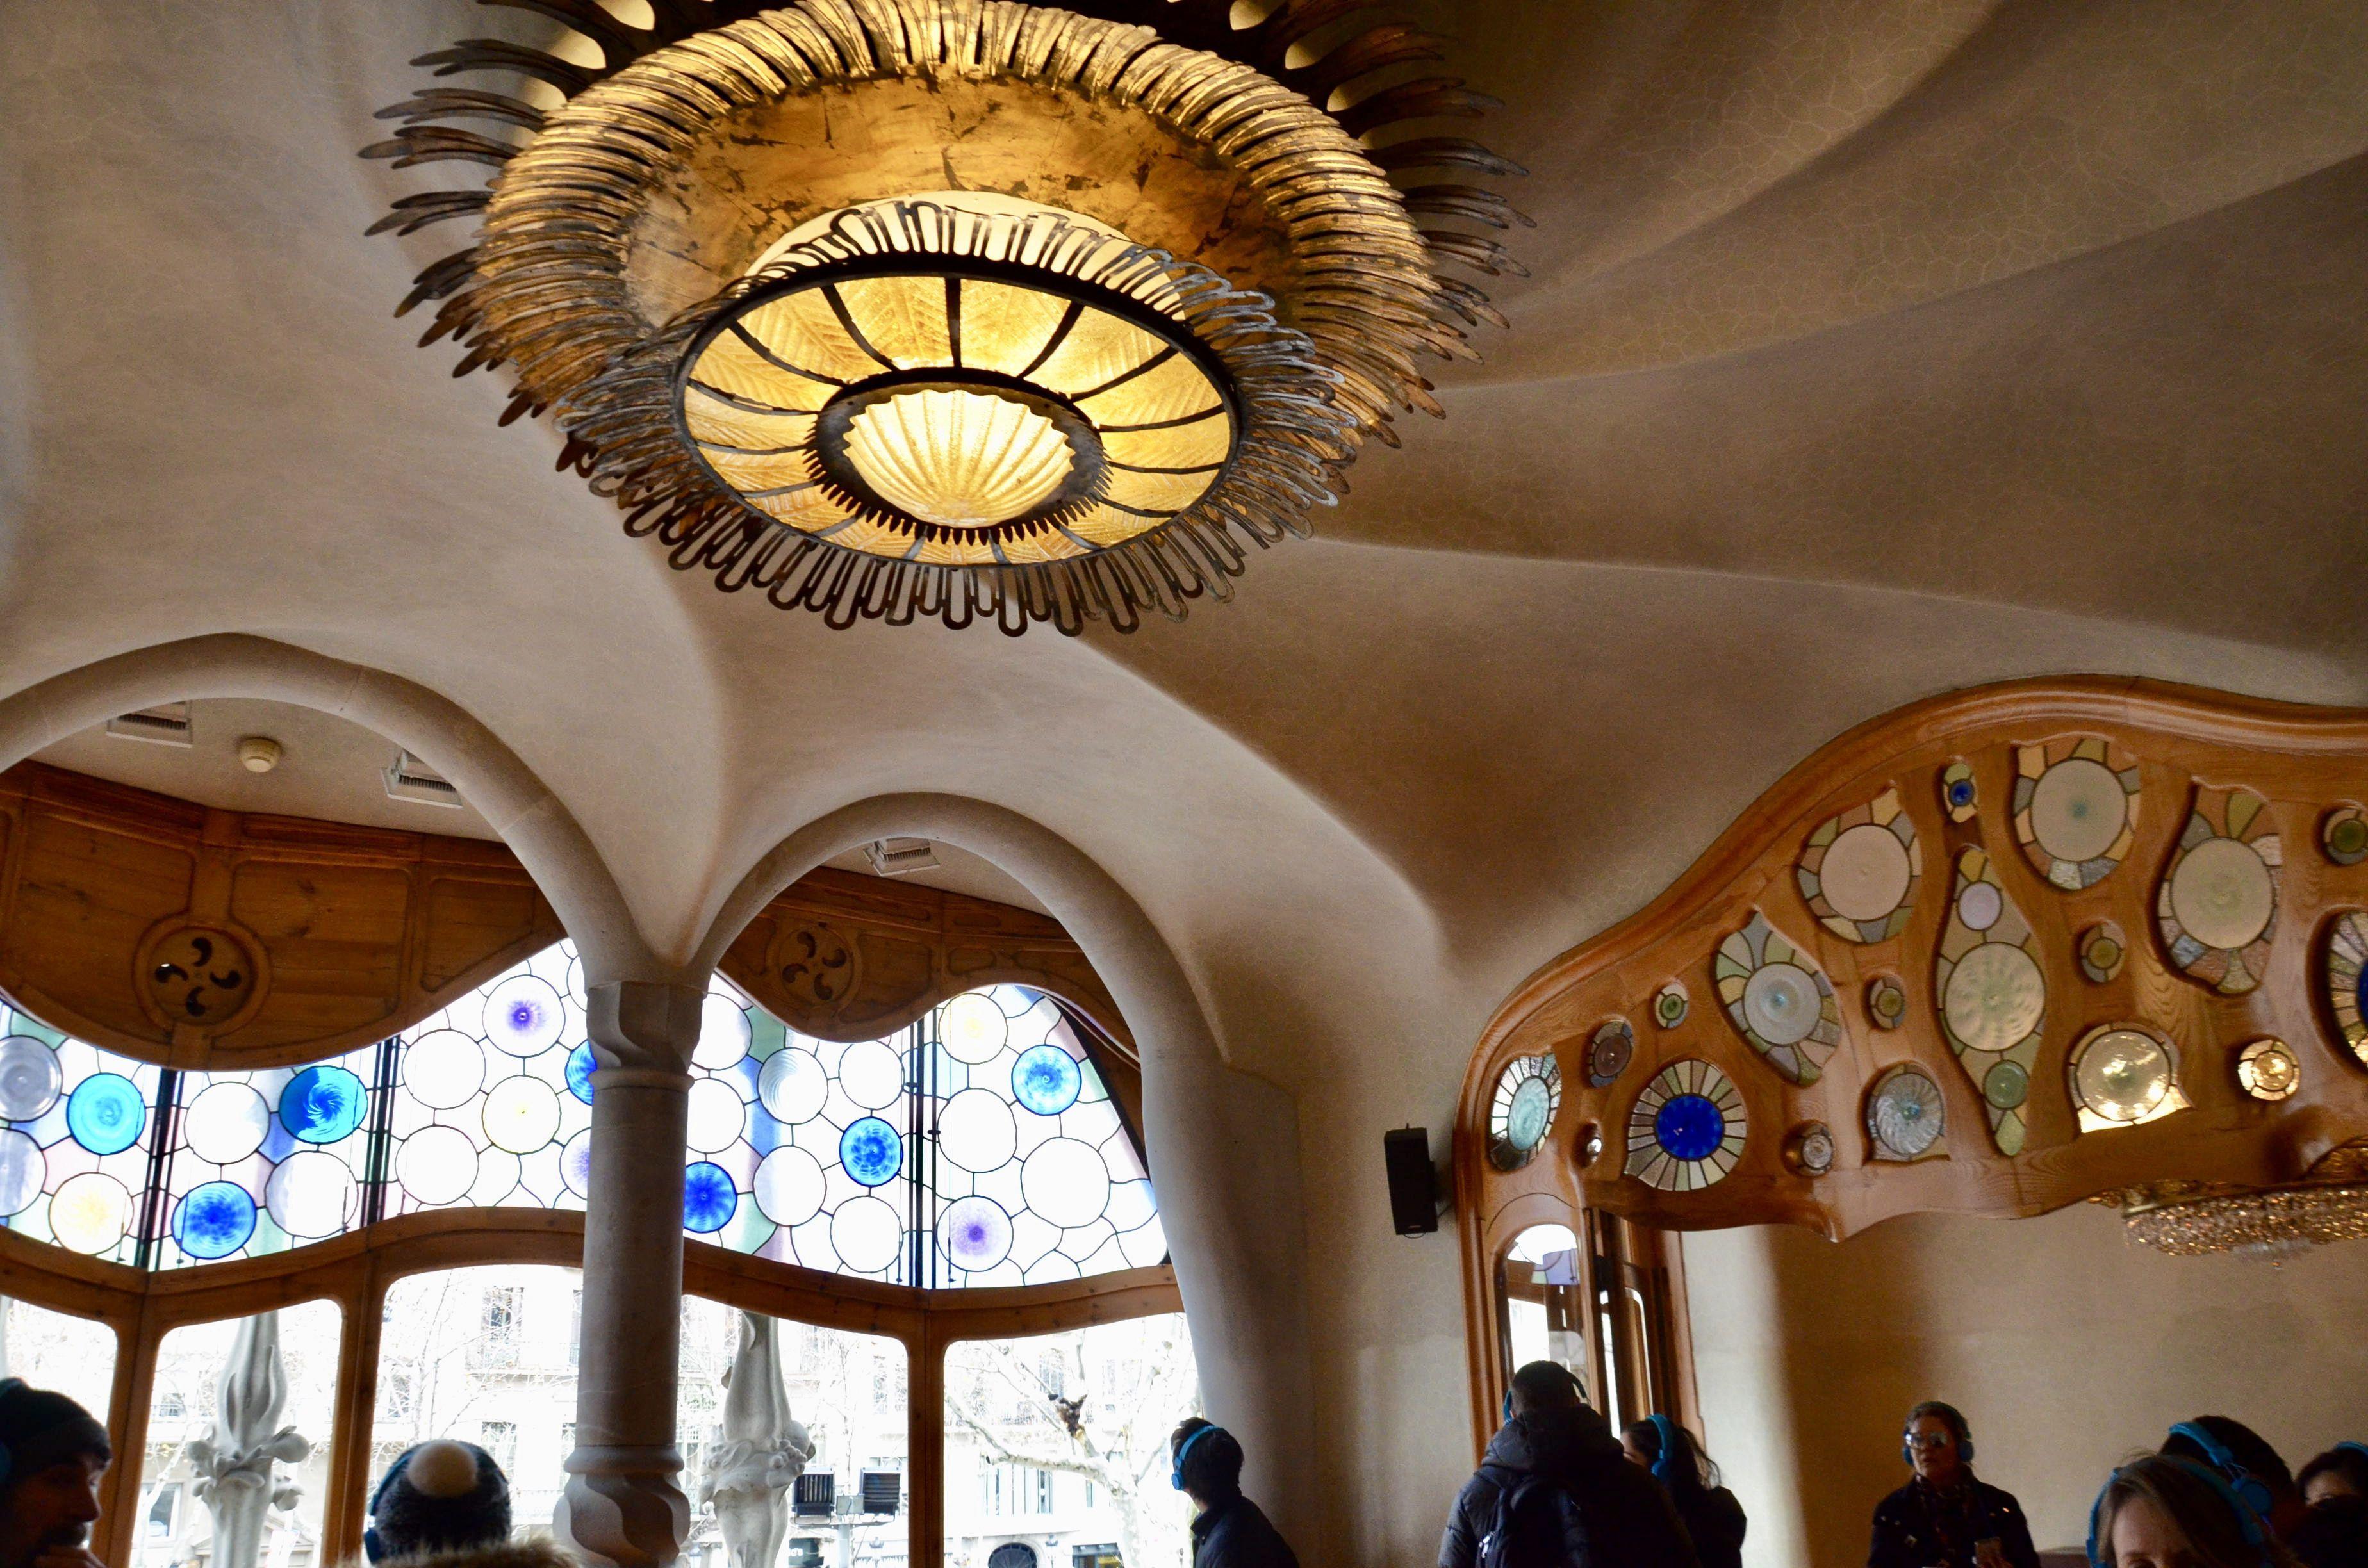 Casa Batlló, Antoni Gaudí Modernist Museum, Barcelona: All year